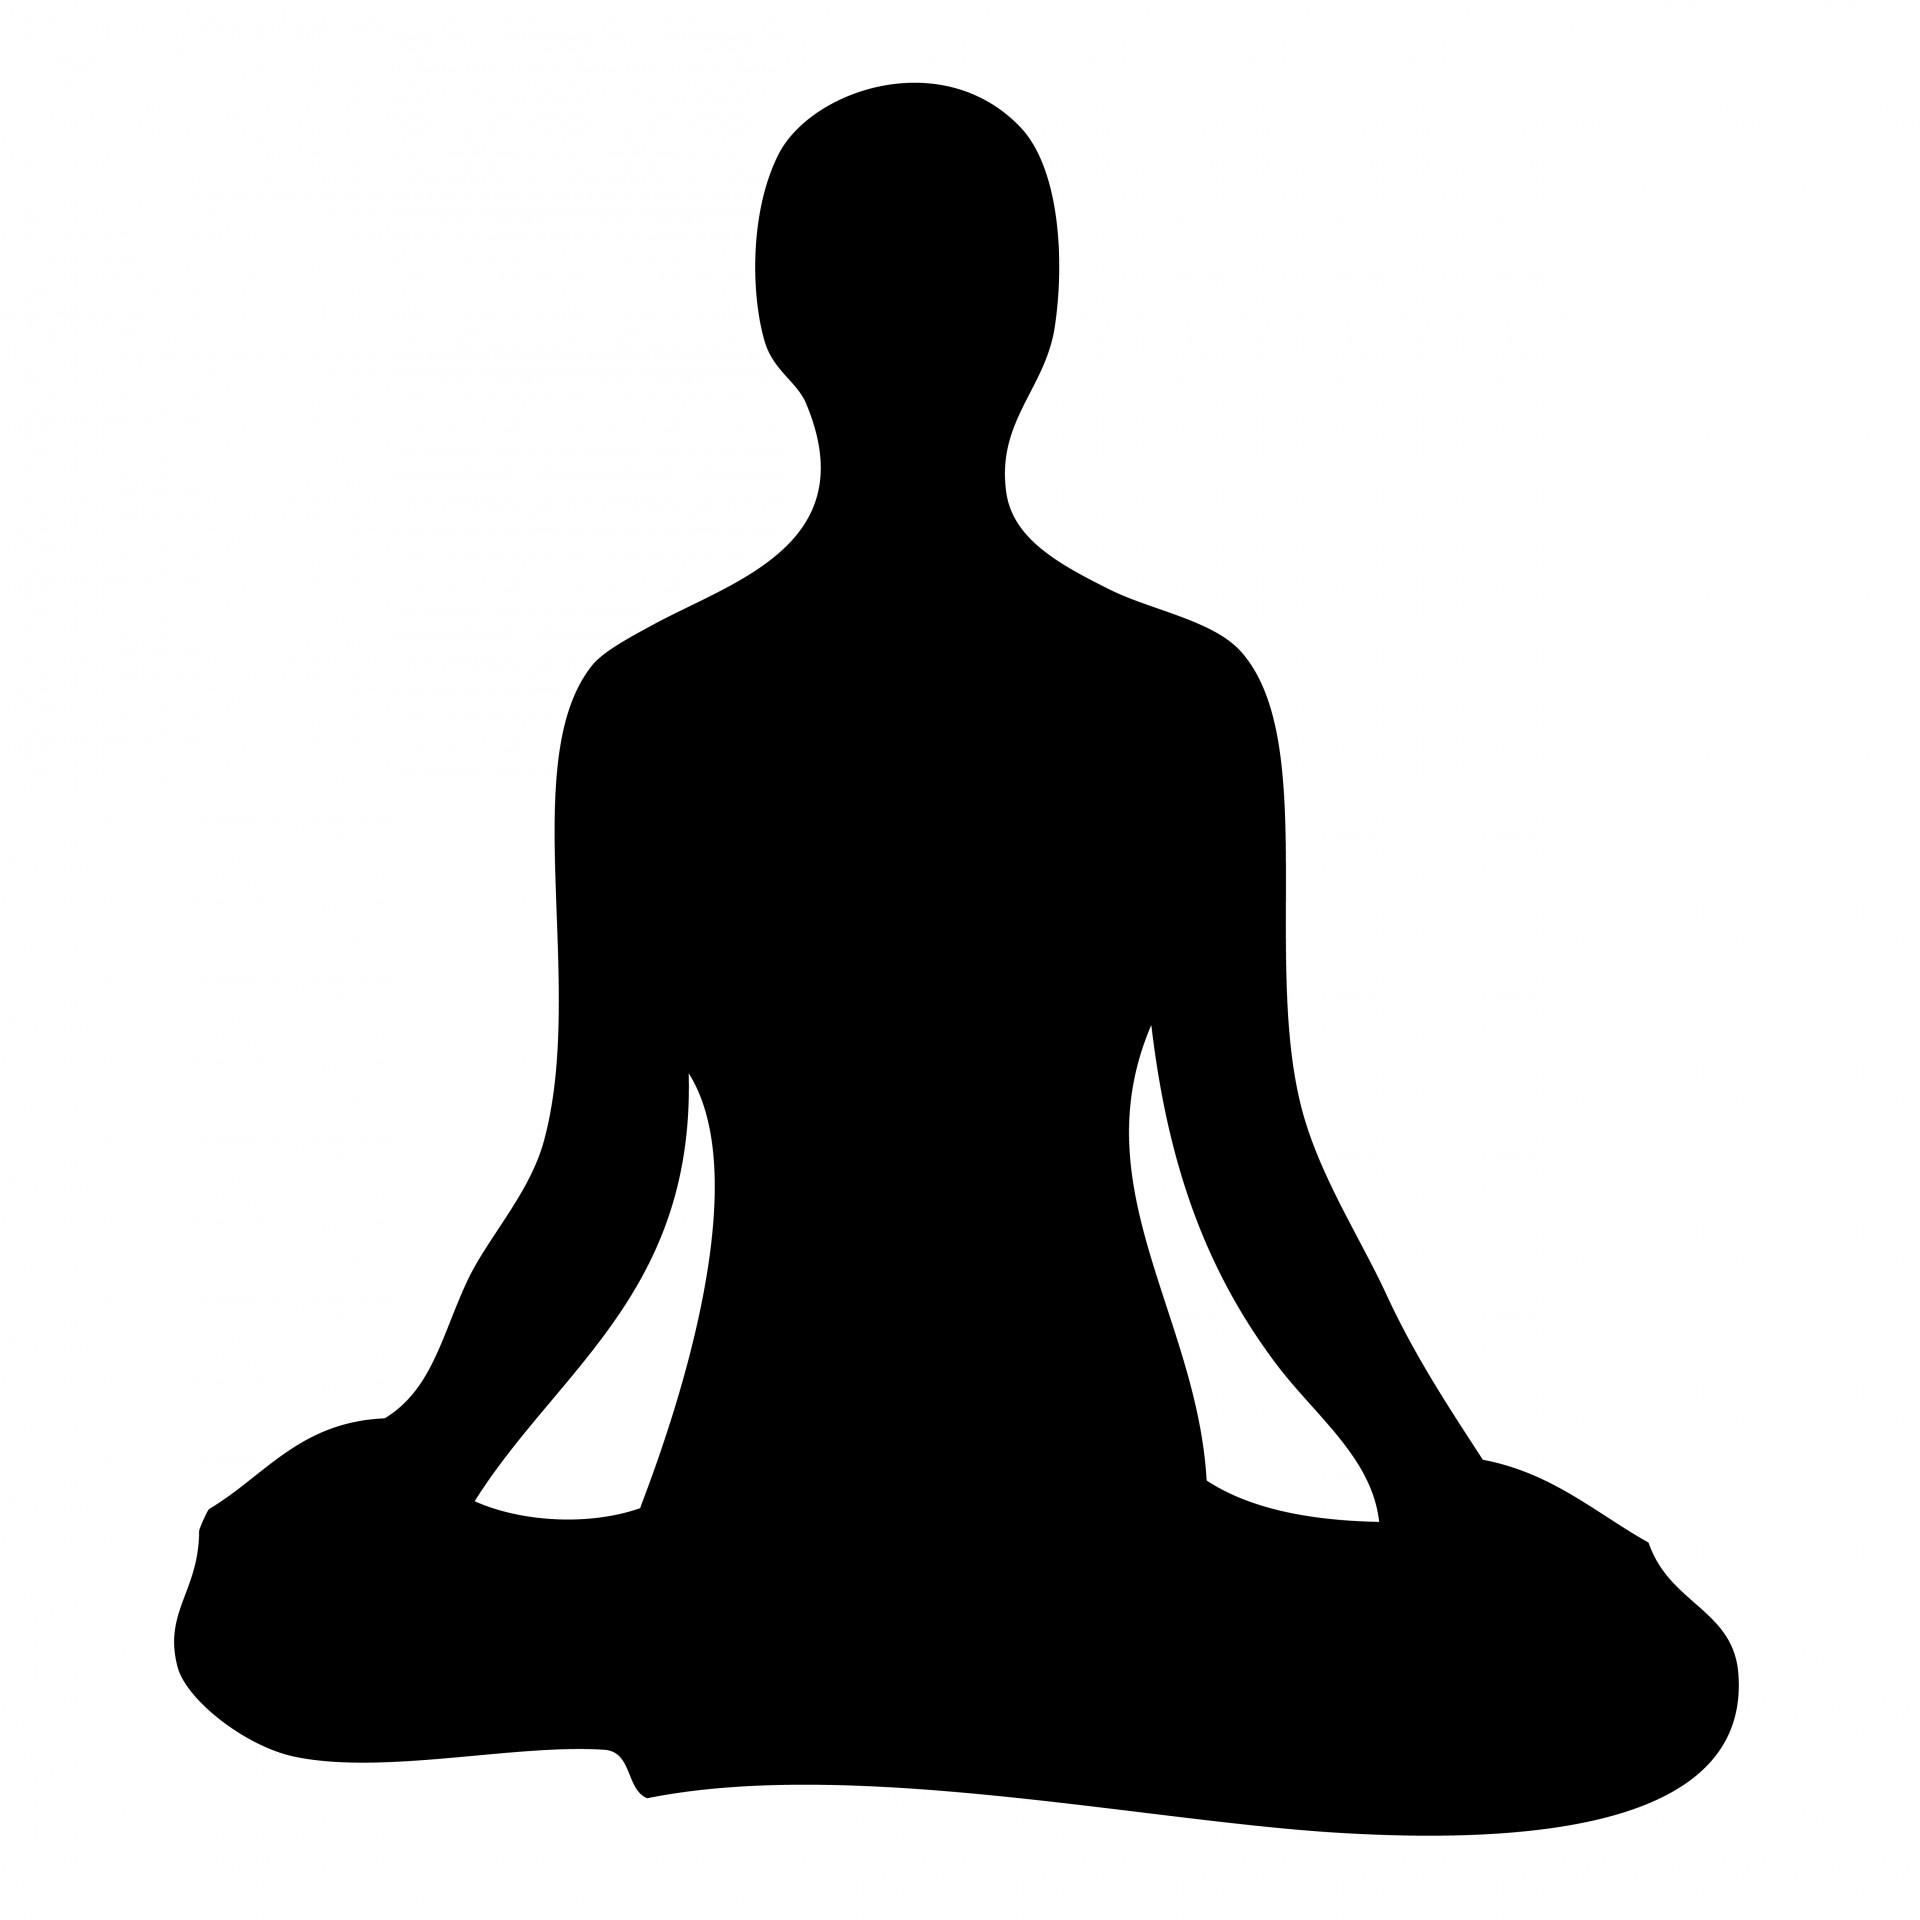 1920x1920 Meditation Free Stock Photo